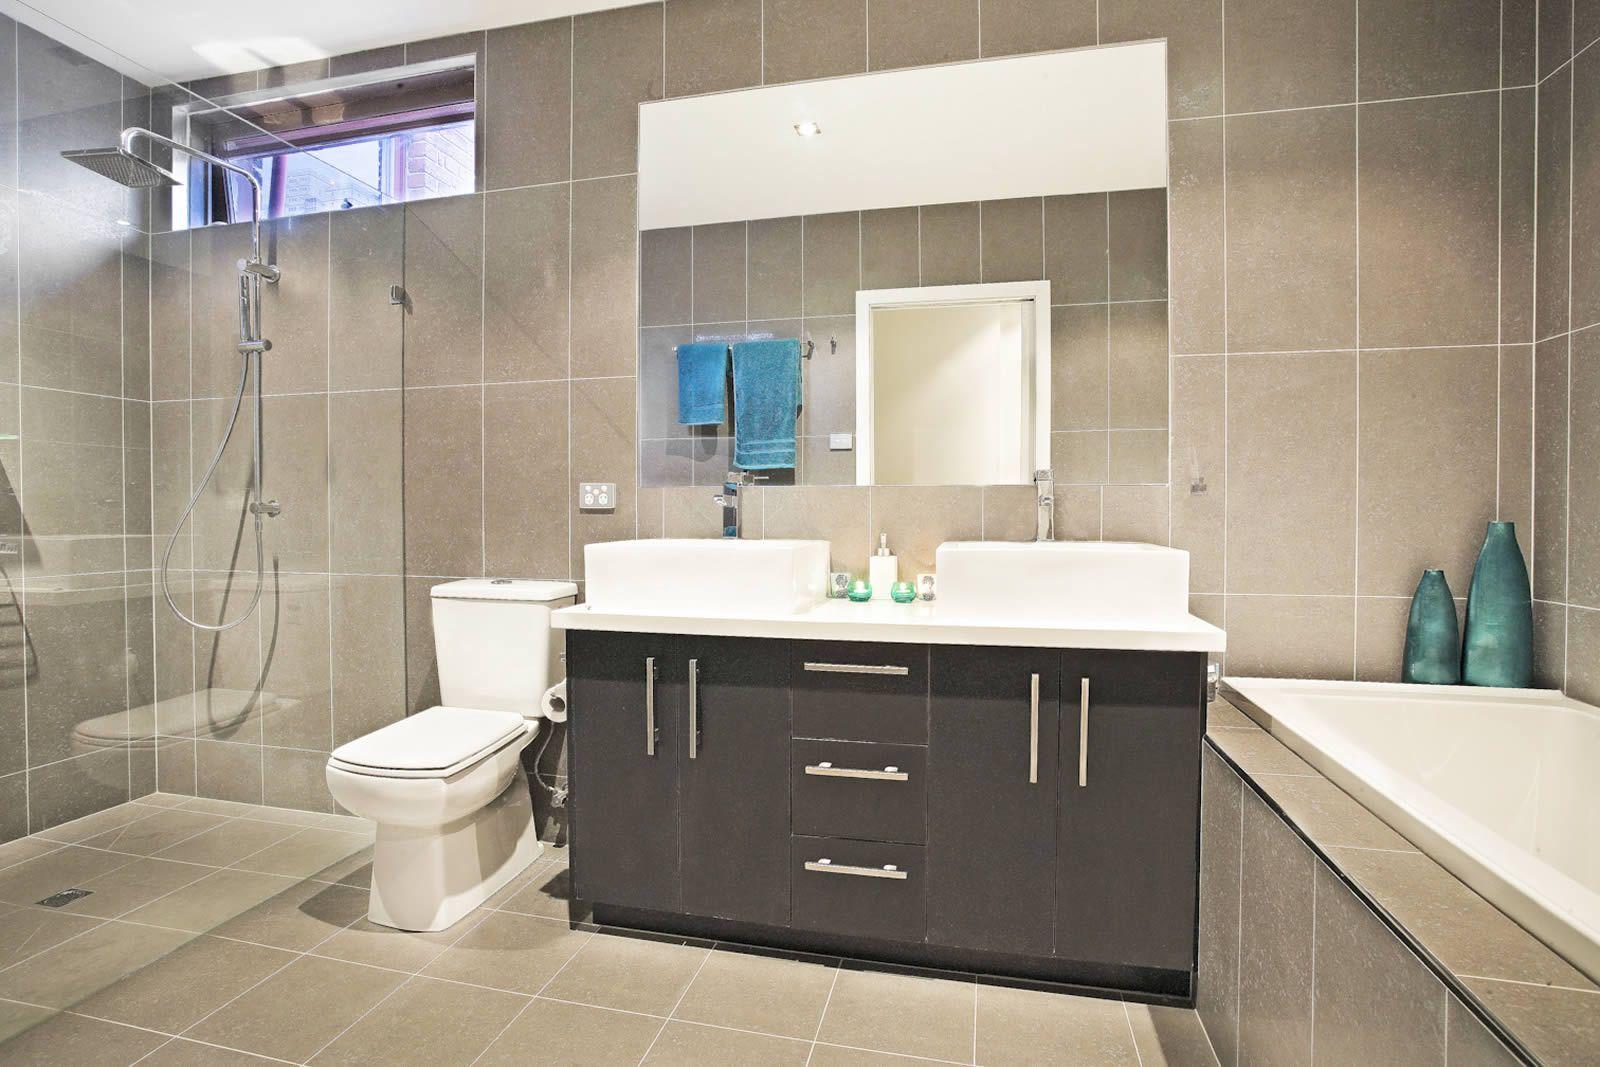 Ordinaire Outstanding Designer Bathrooms Creative Ideas Interior Designer Bathroom  Melbourne Southnextus Check More At Http:/